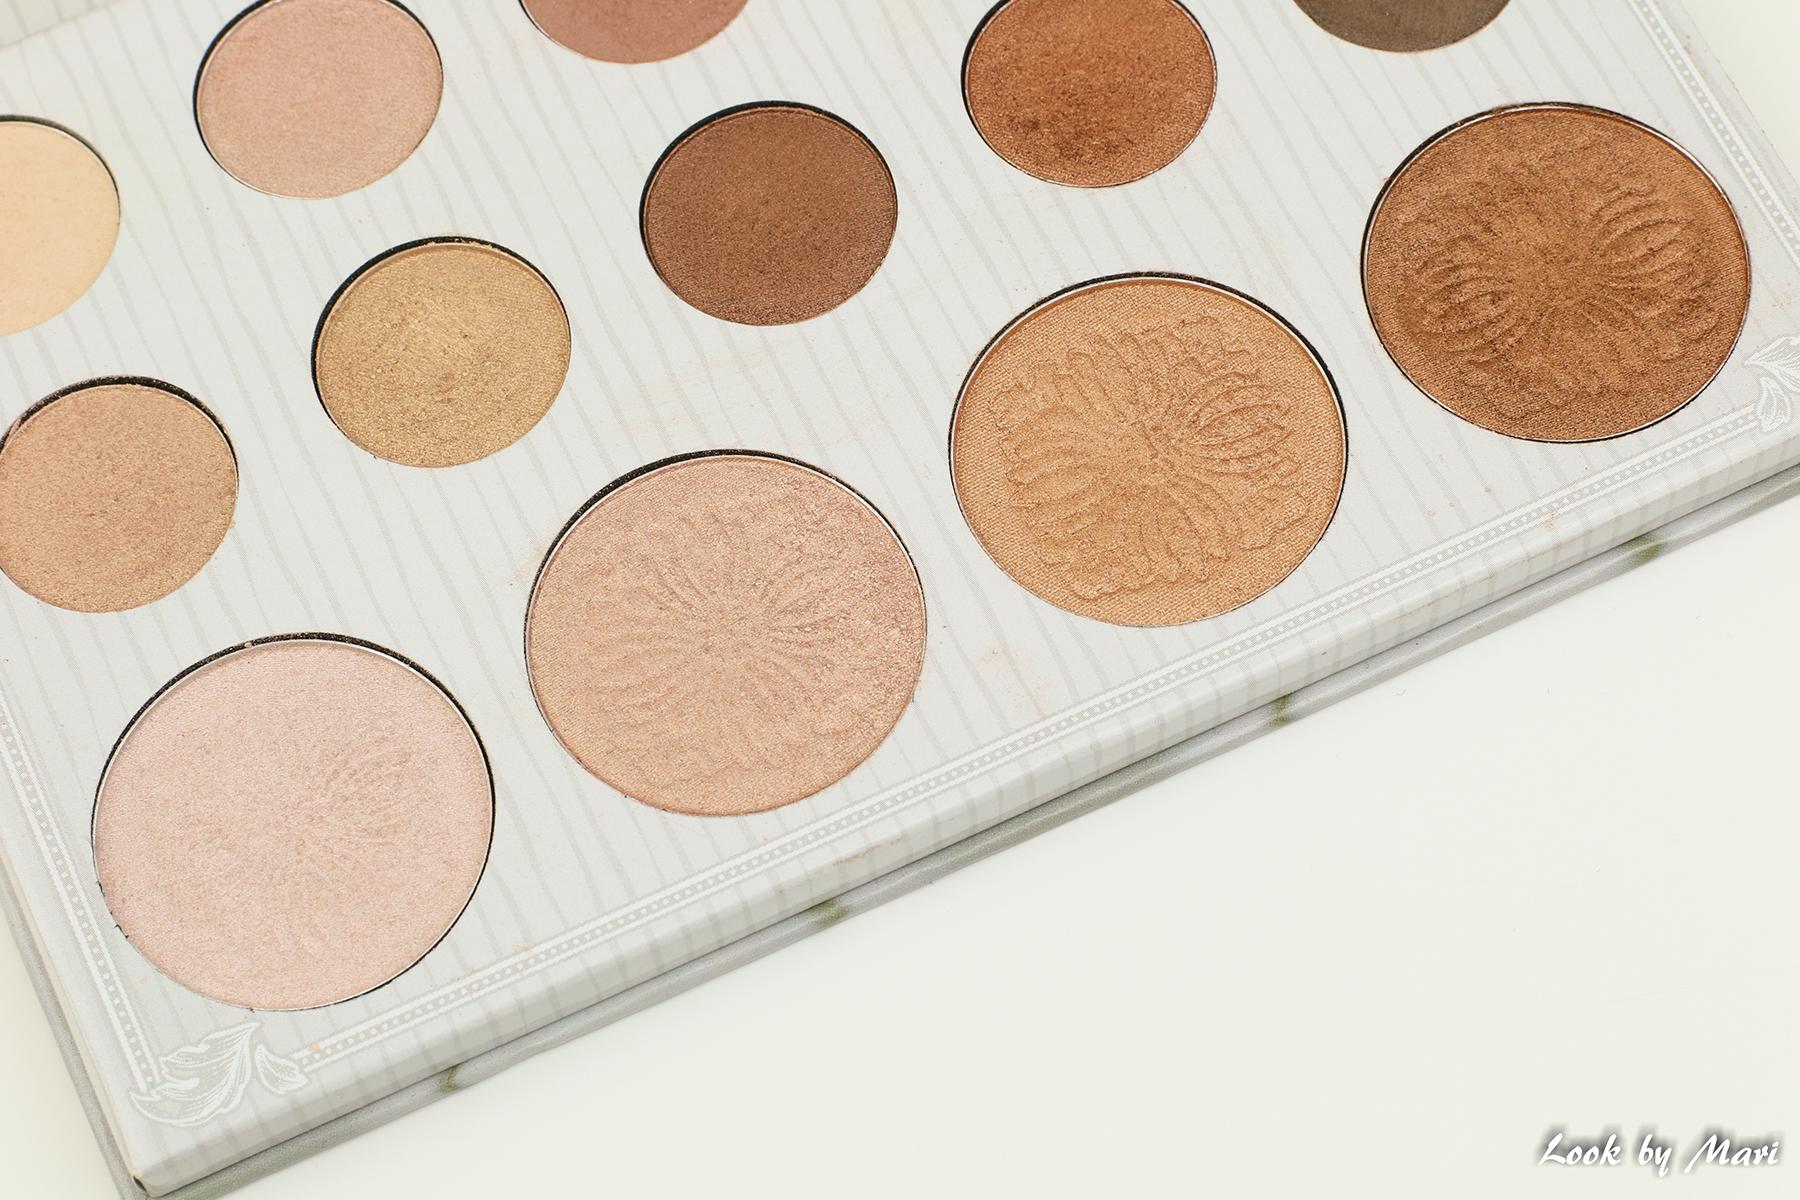 5 bh cosmetics x carli bybel luomiväri & highlighter paletti värit sävyt suomesta suomeen